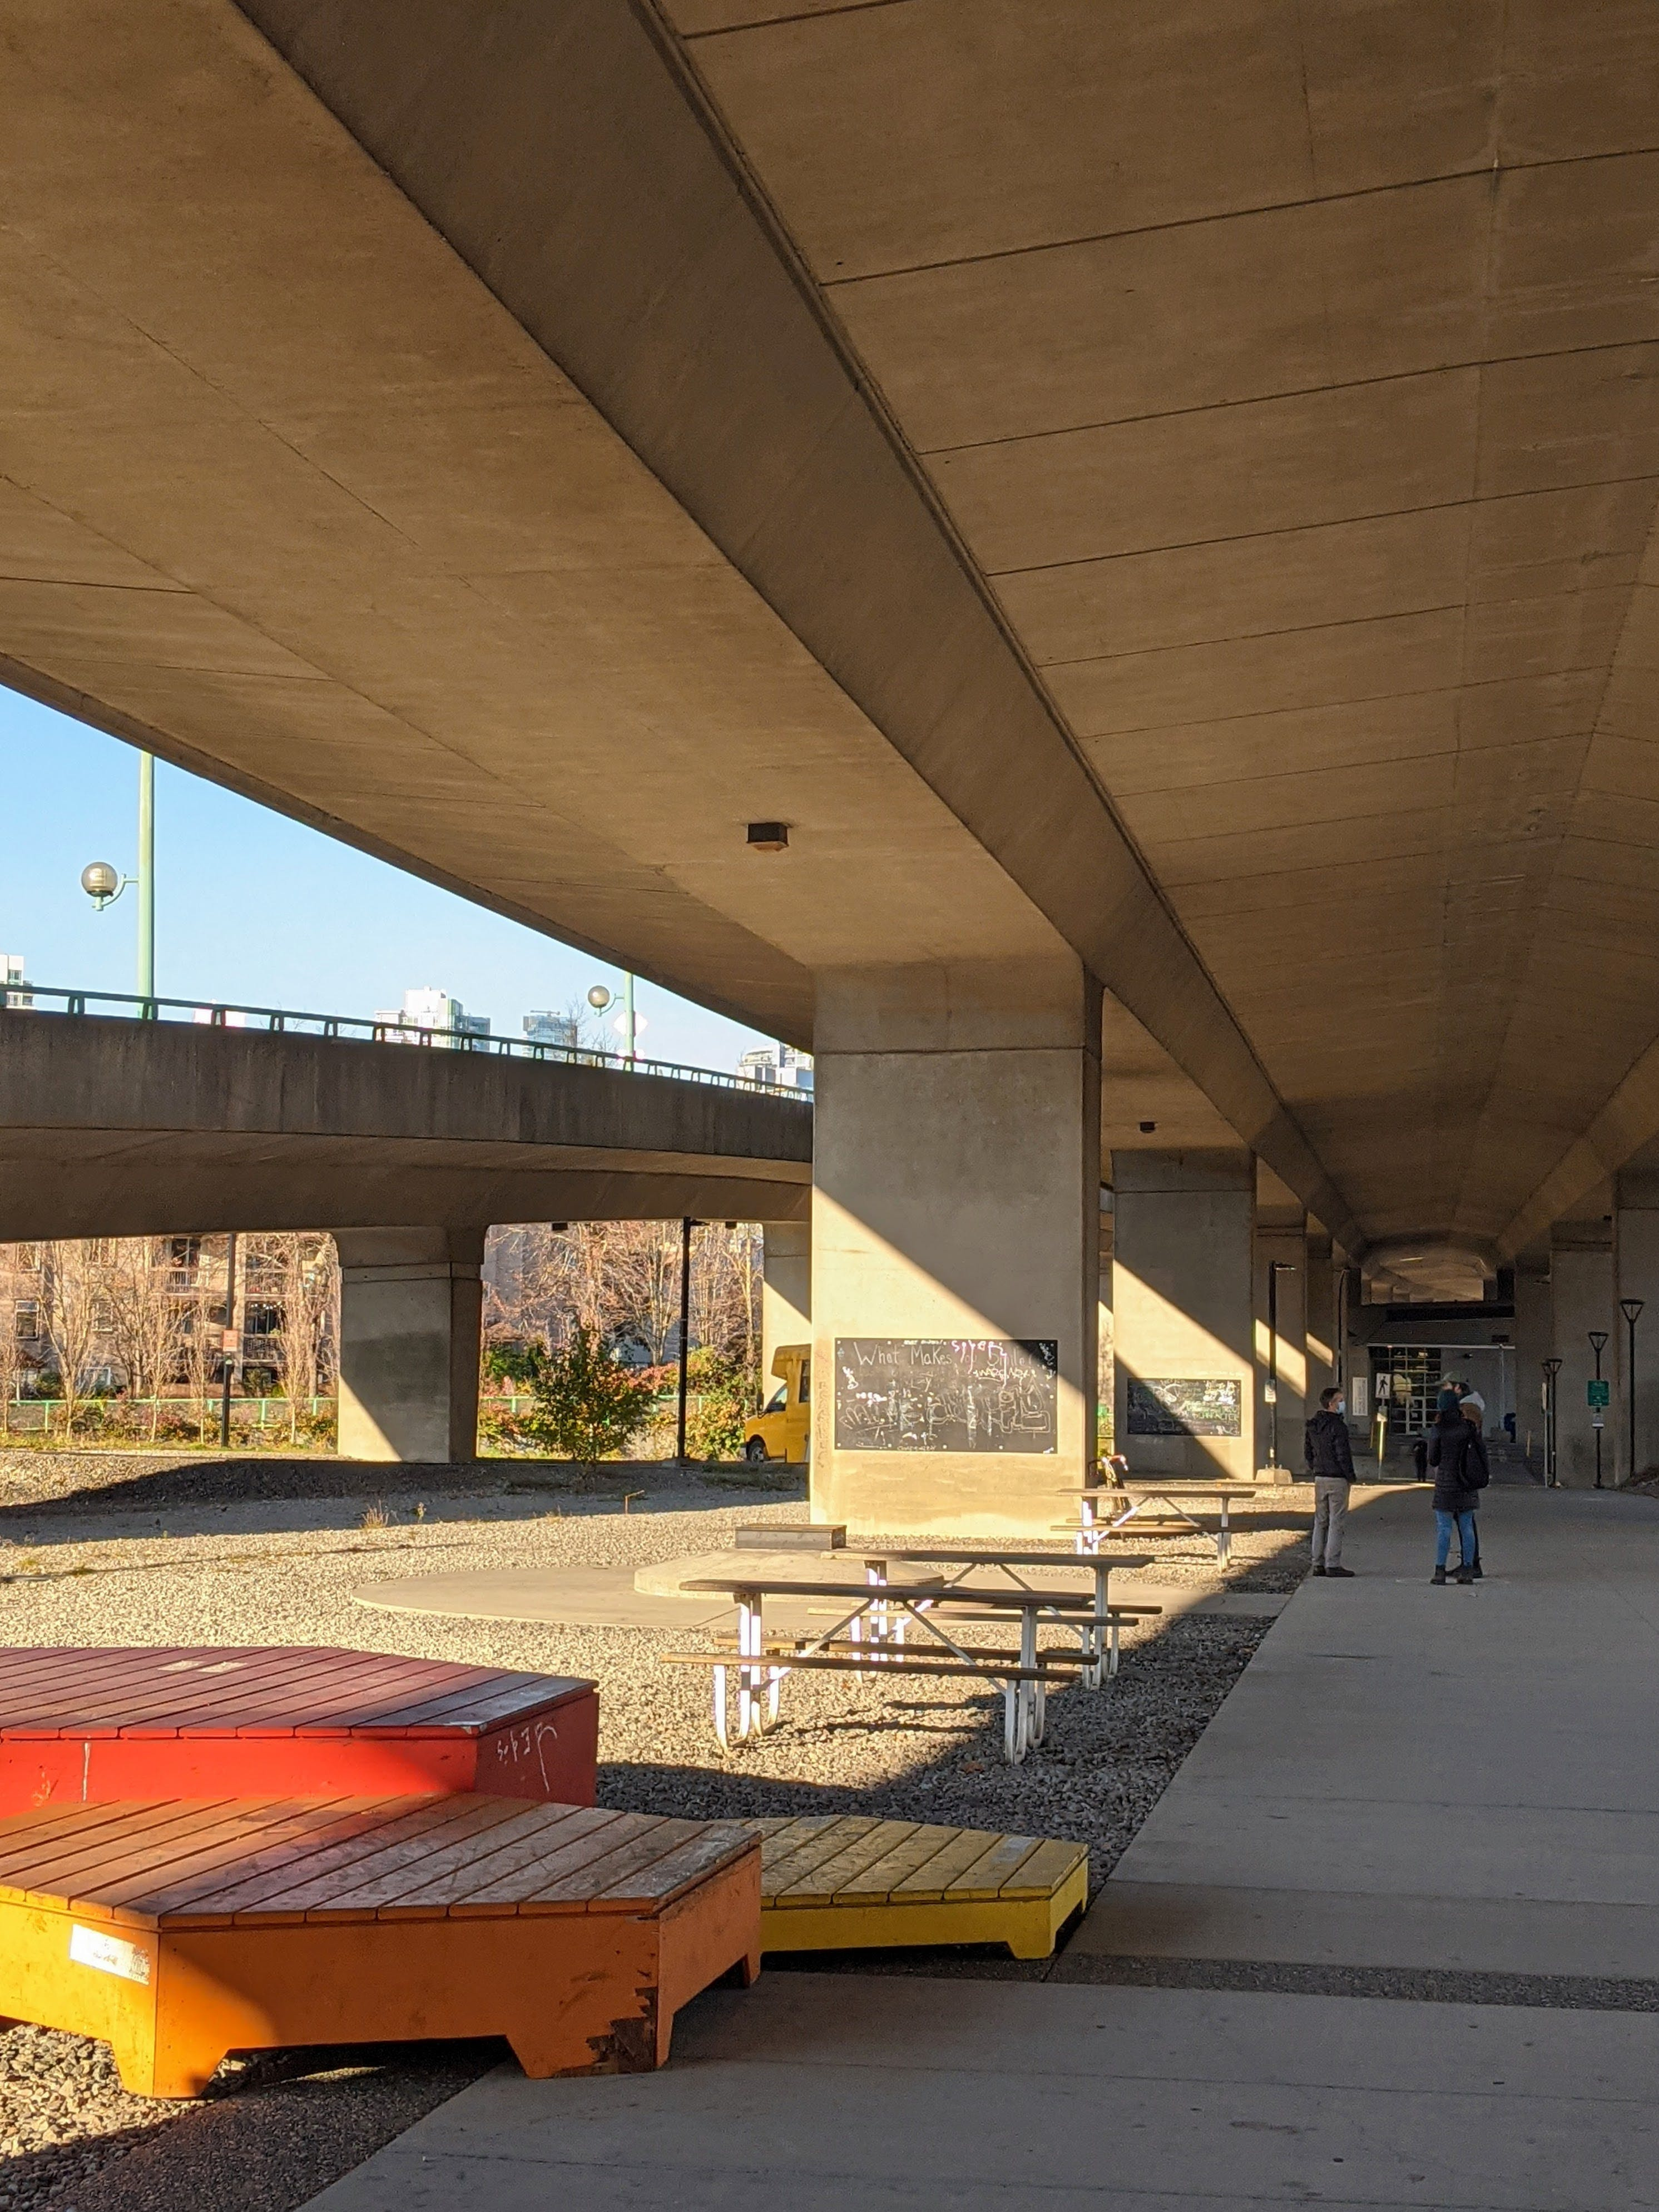 Cambie Bridge South & W 1st Ave Rain-Friendly Plaza